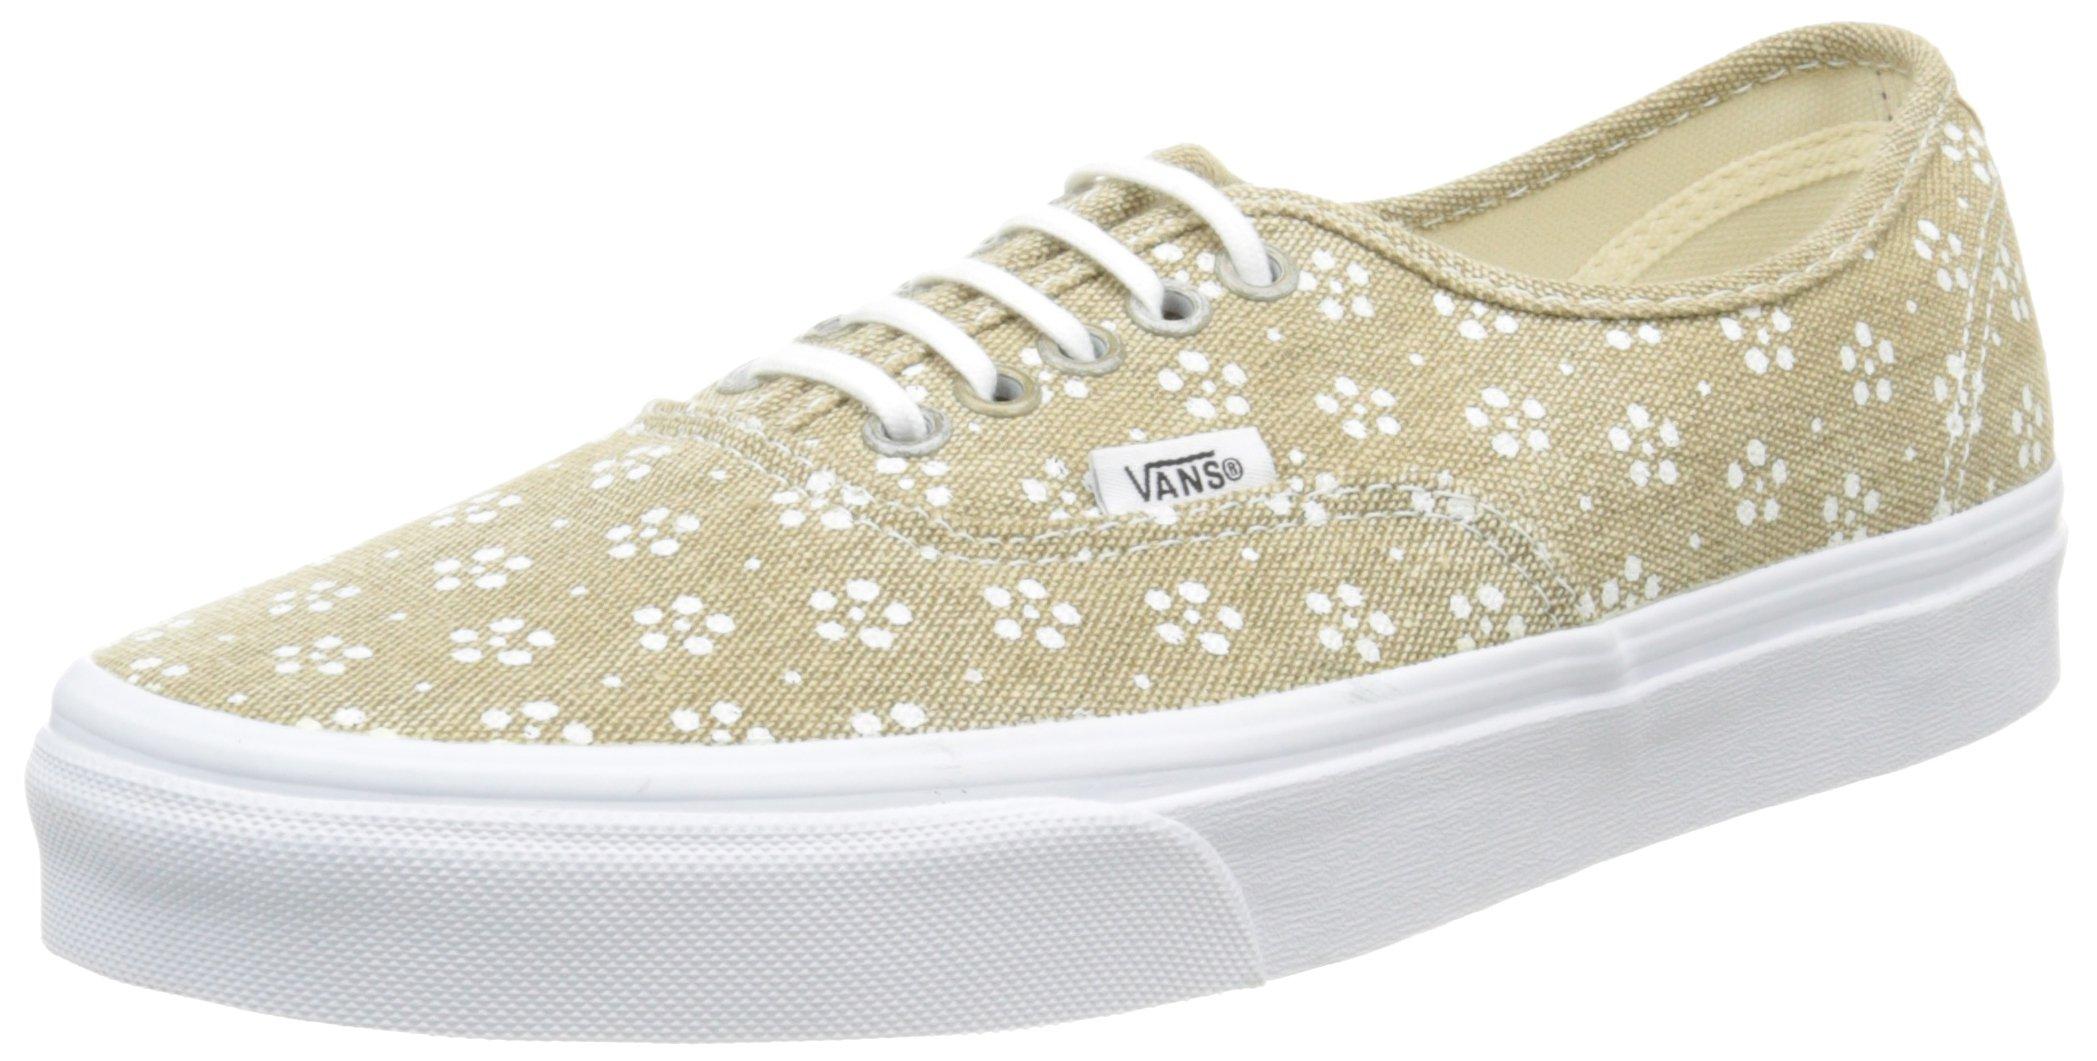 298cd9ede0 Vans Authentic, Unisex Adults' Low-Top Sneakers, Beige  (Webbing/Batik/Safari), 7.5 UK (41 EU)